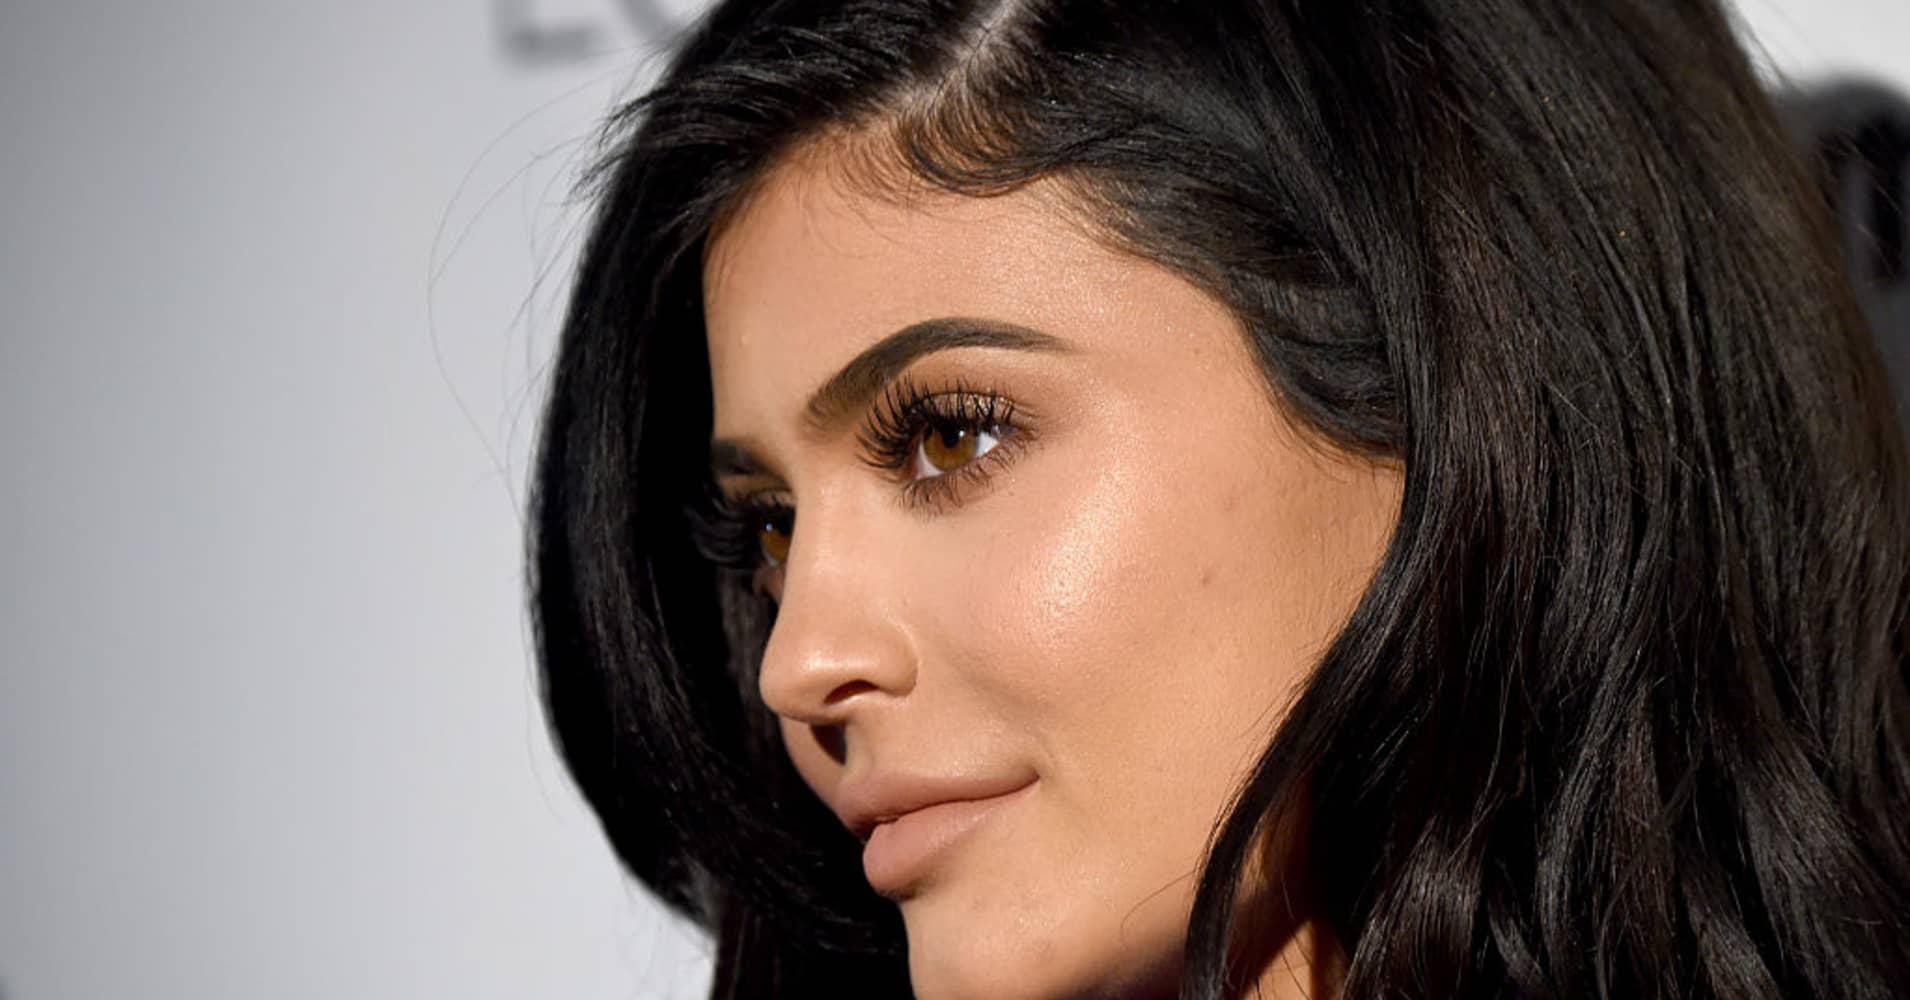 Kylie Jenner makes $1 million per paid Instagram post